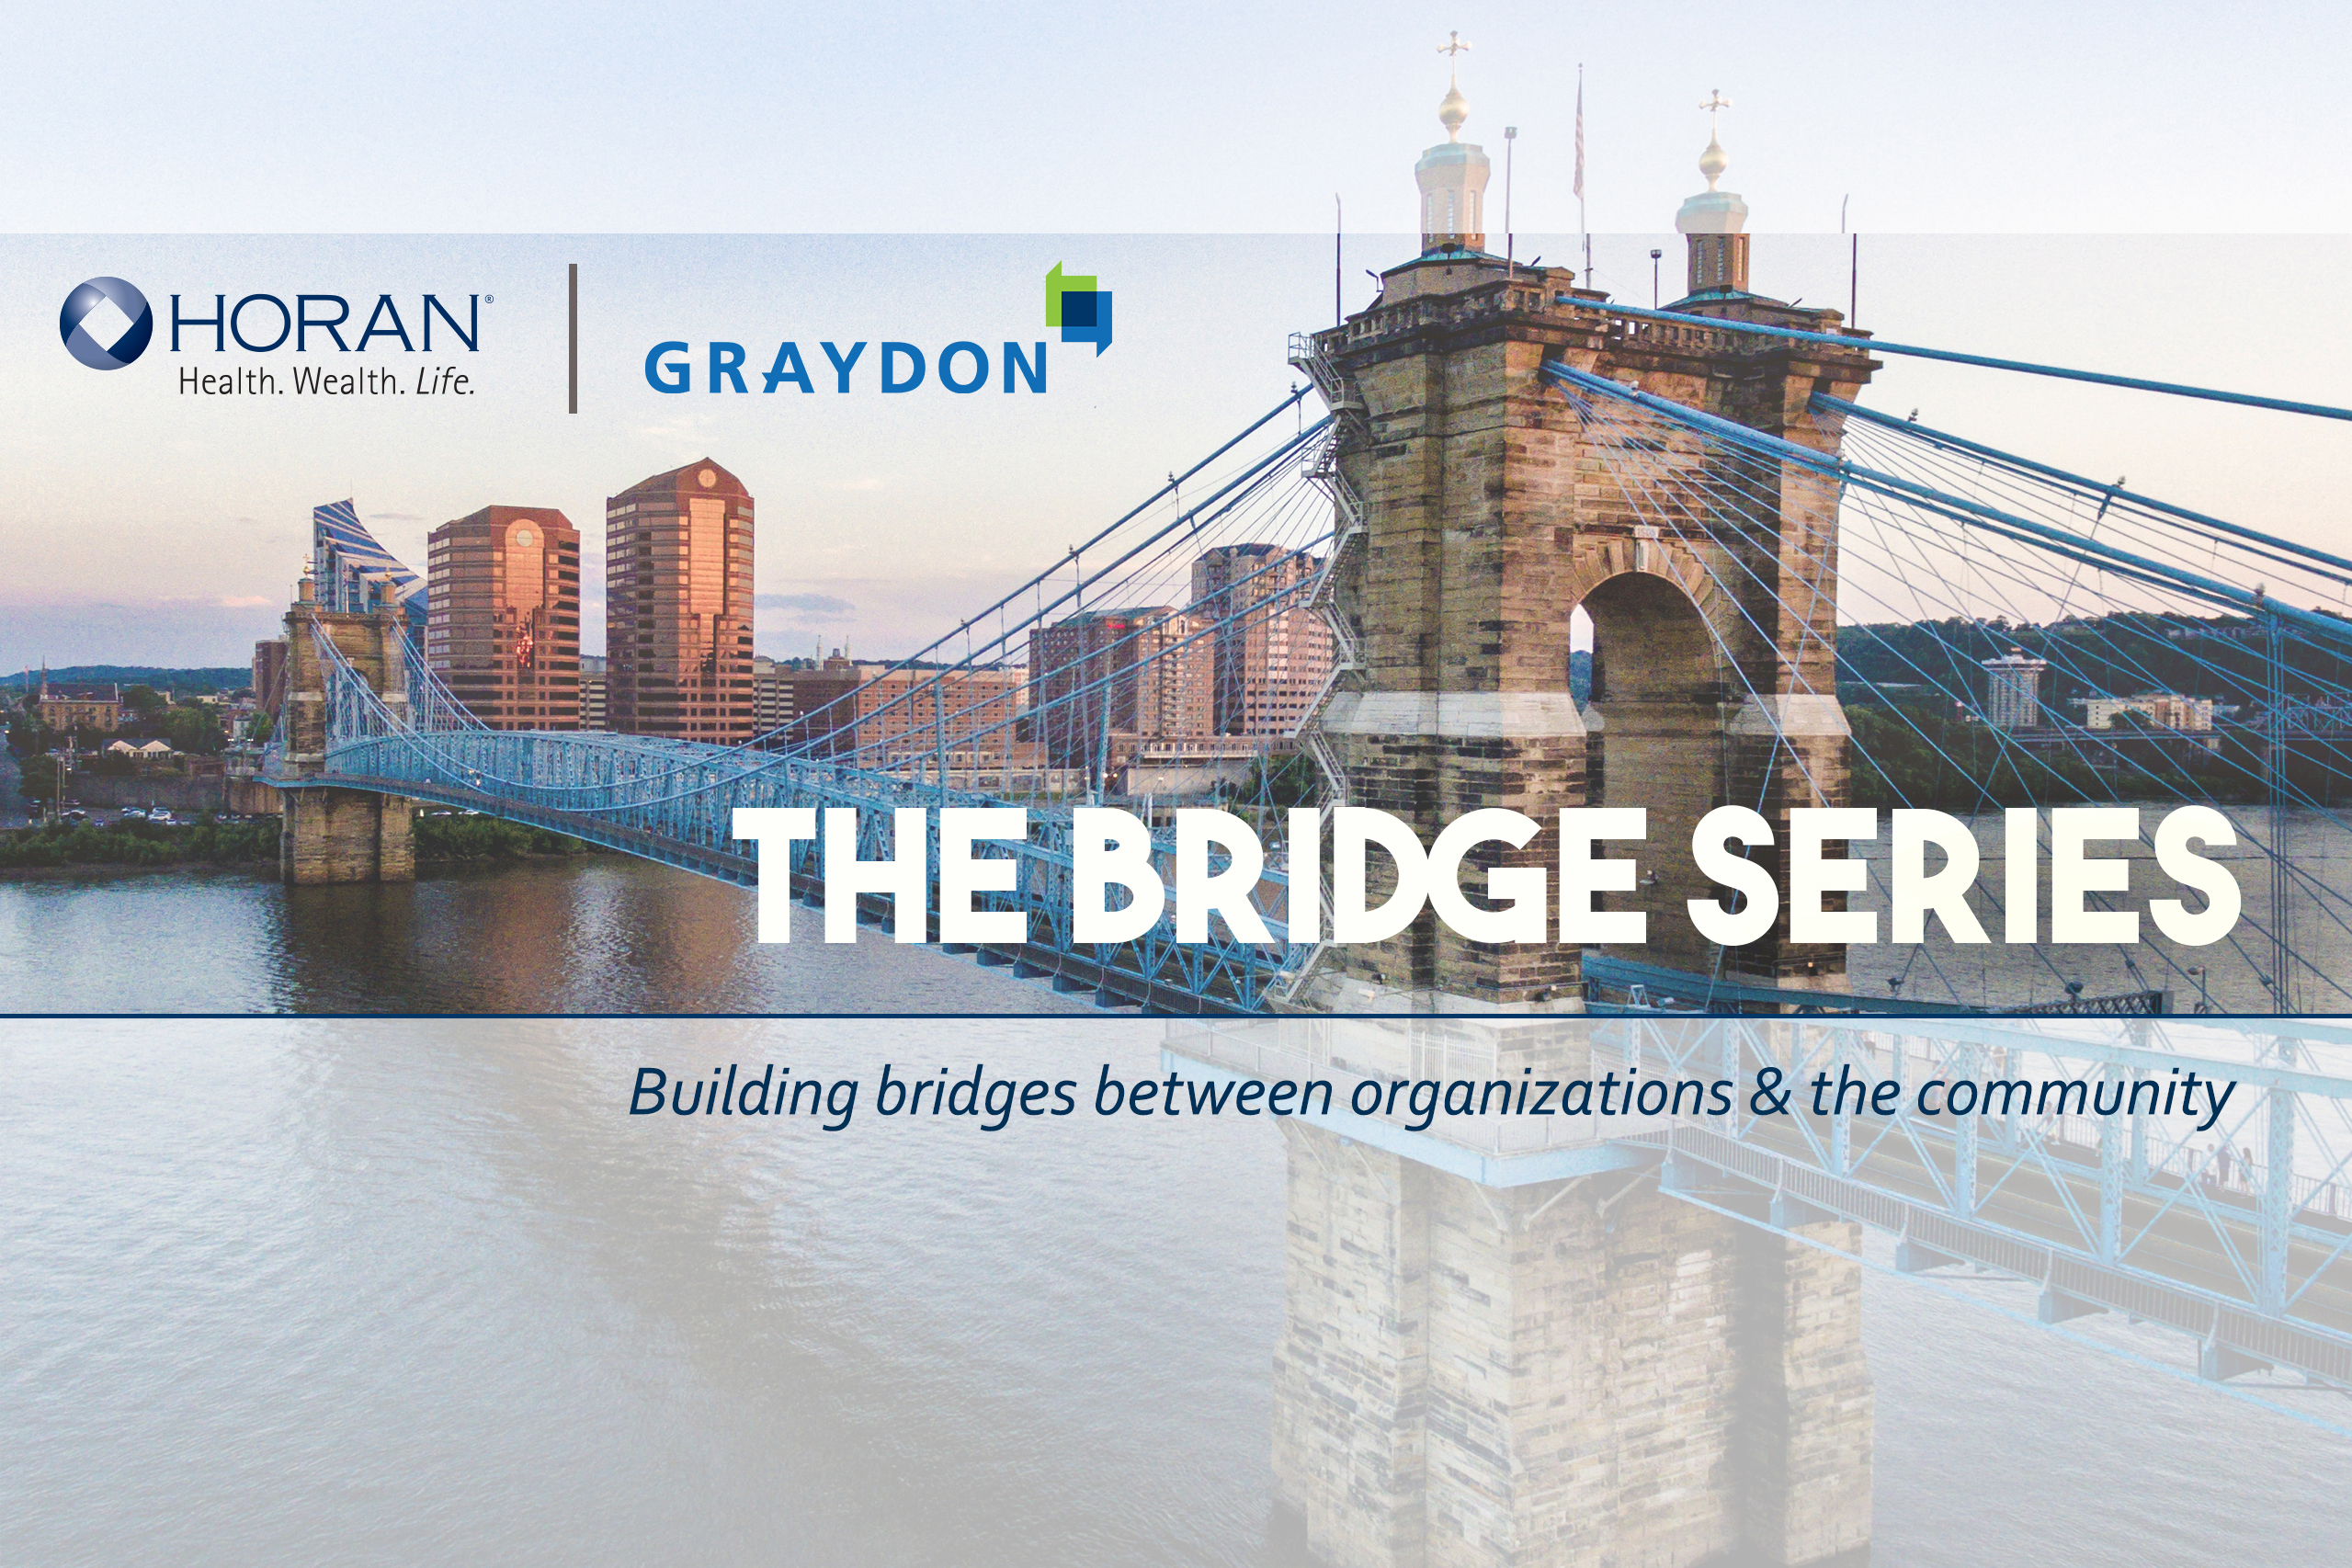 Bridge Series Graydon Horan